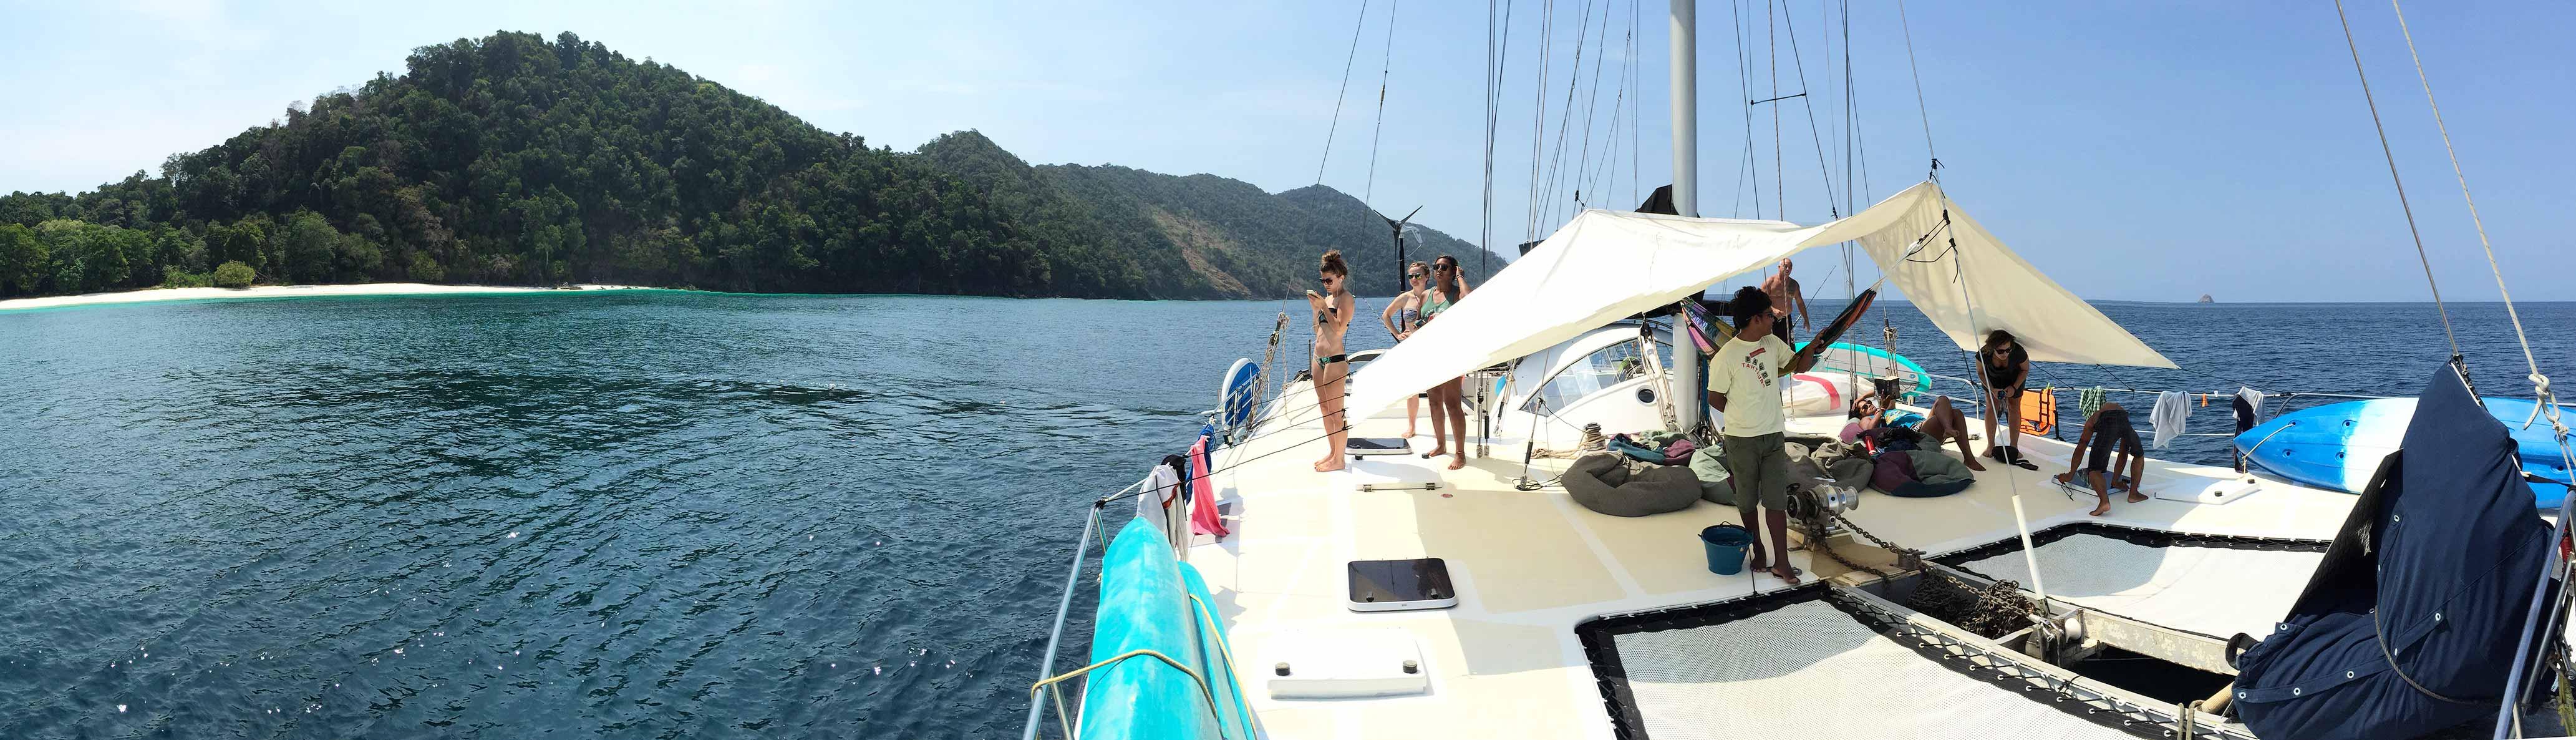 Myanmar (Burma) Sailing Experience ex Phuket (Comfort)